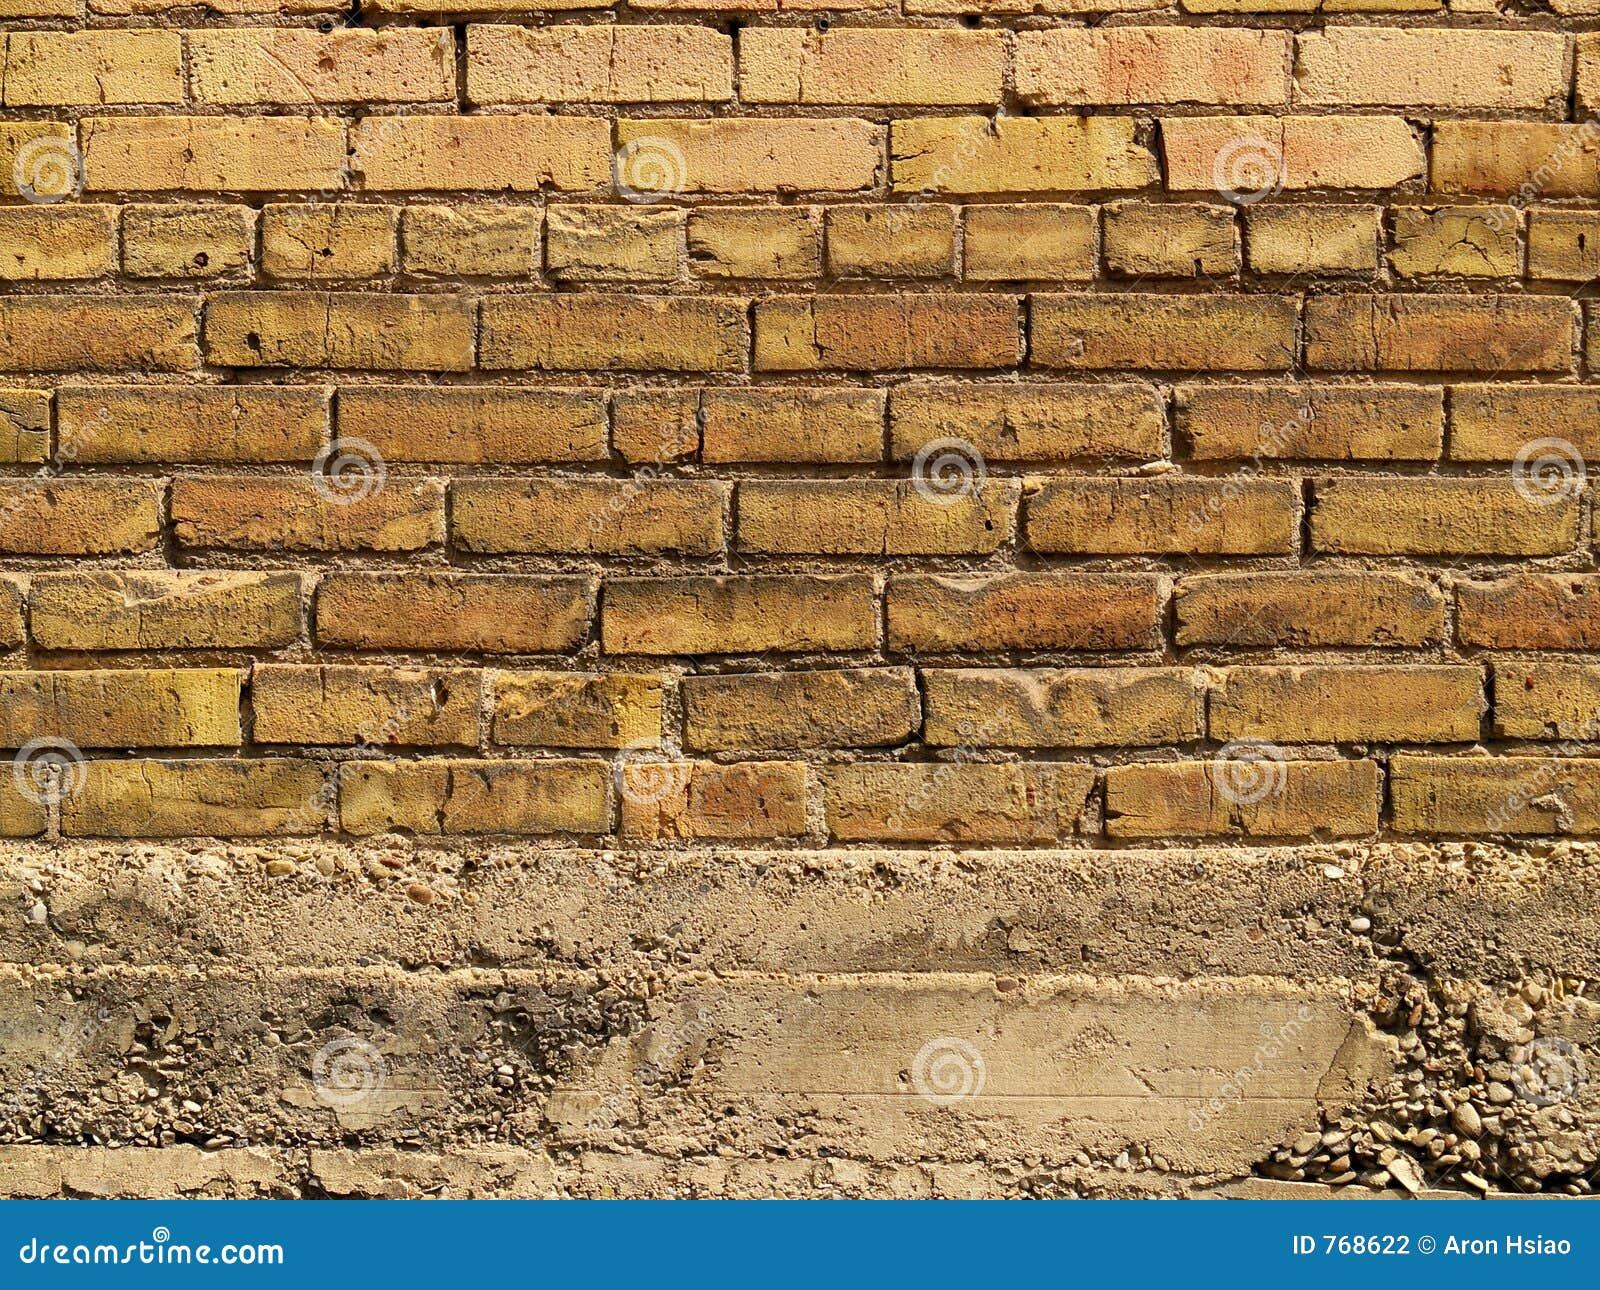 Orange Cement Wall : Orange and yellow brick wall over concrete stock photo